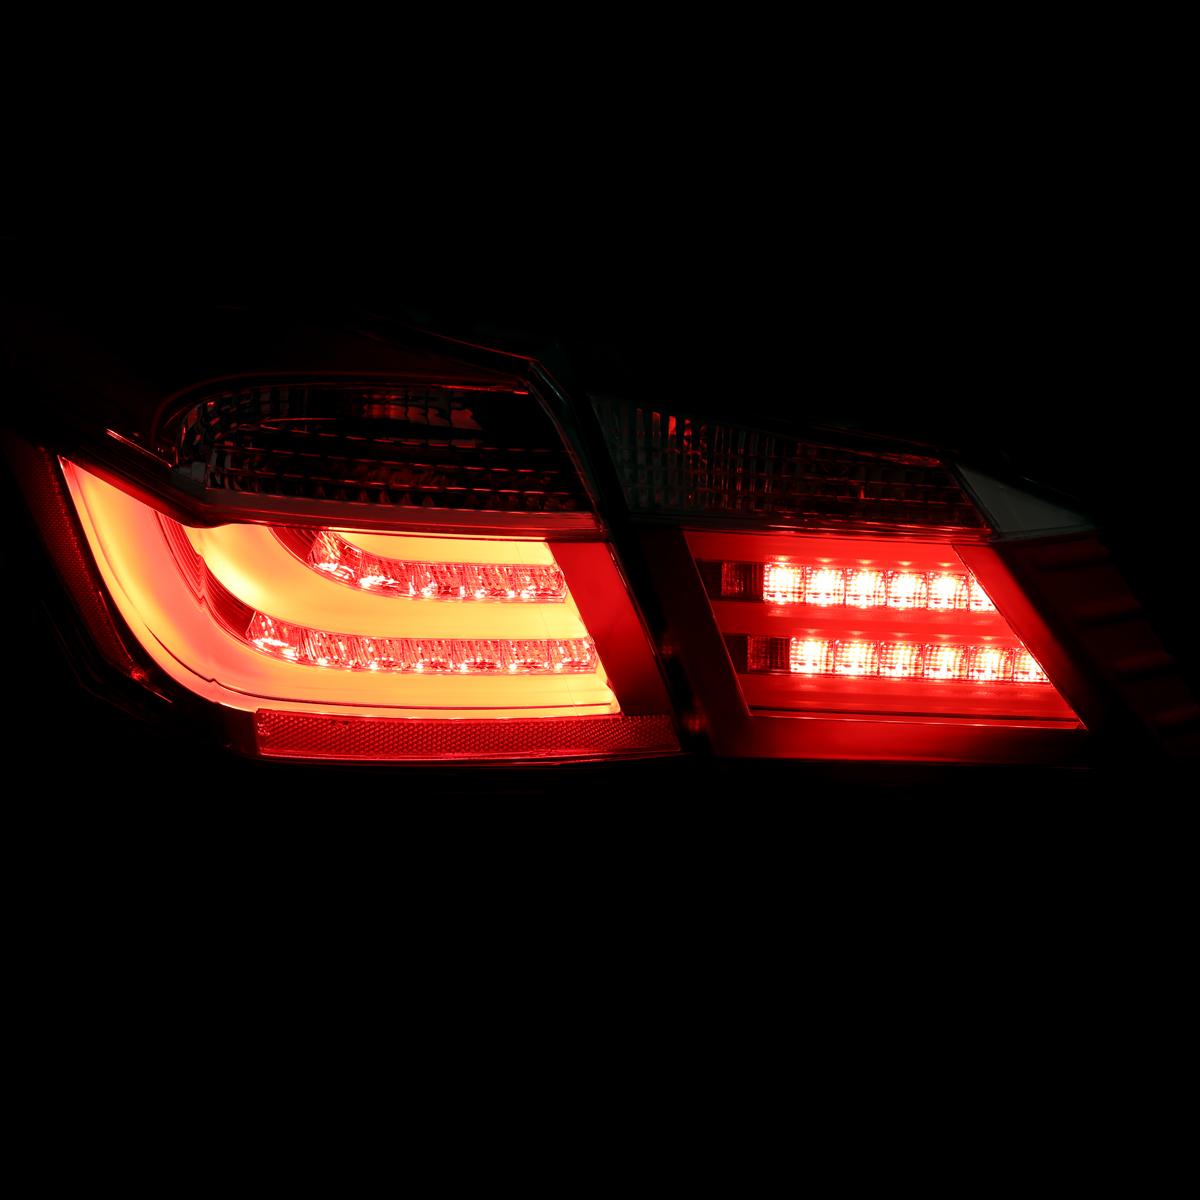 2013 2014 2015 honda accord lx ex sports sedan bmw style red led tail lights set ebay. Black Bedroom Furniture Sets. Home Design Ideas